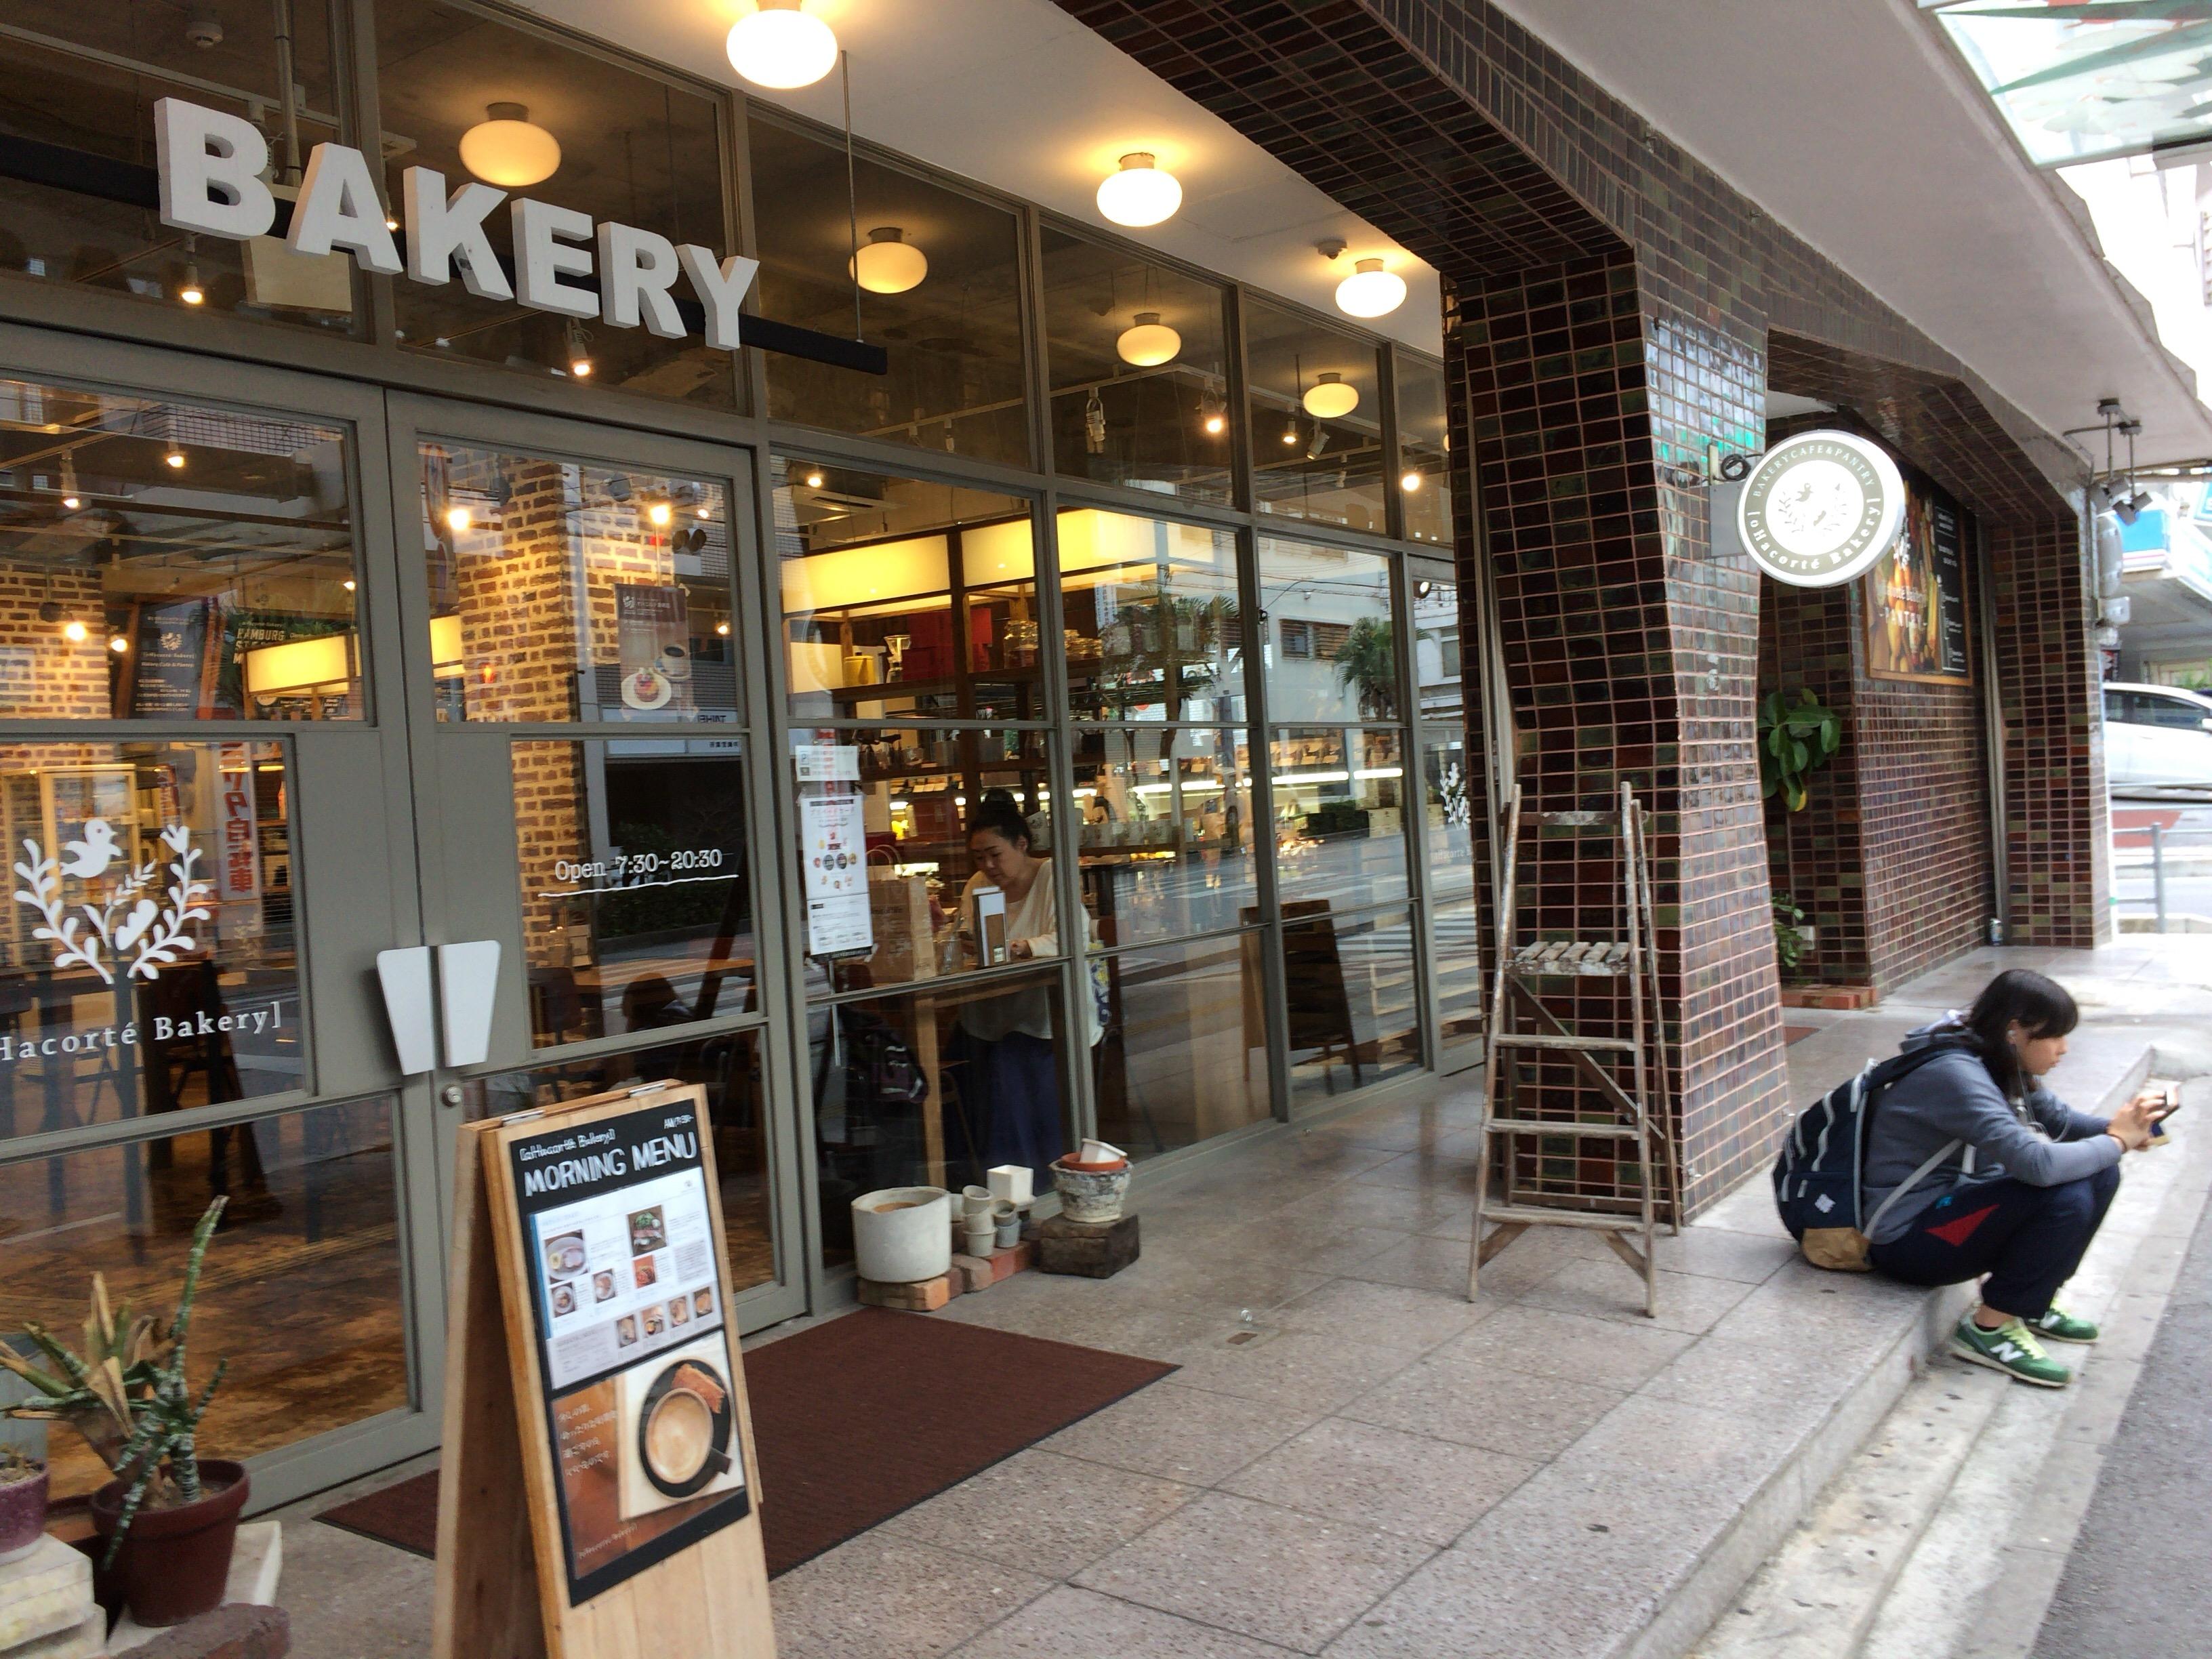 oHacorte Bakery